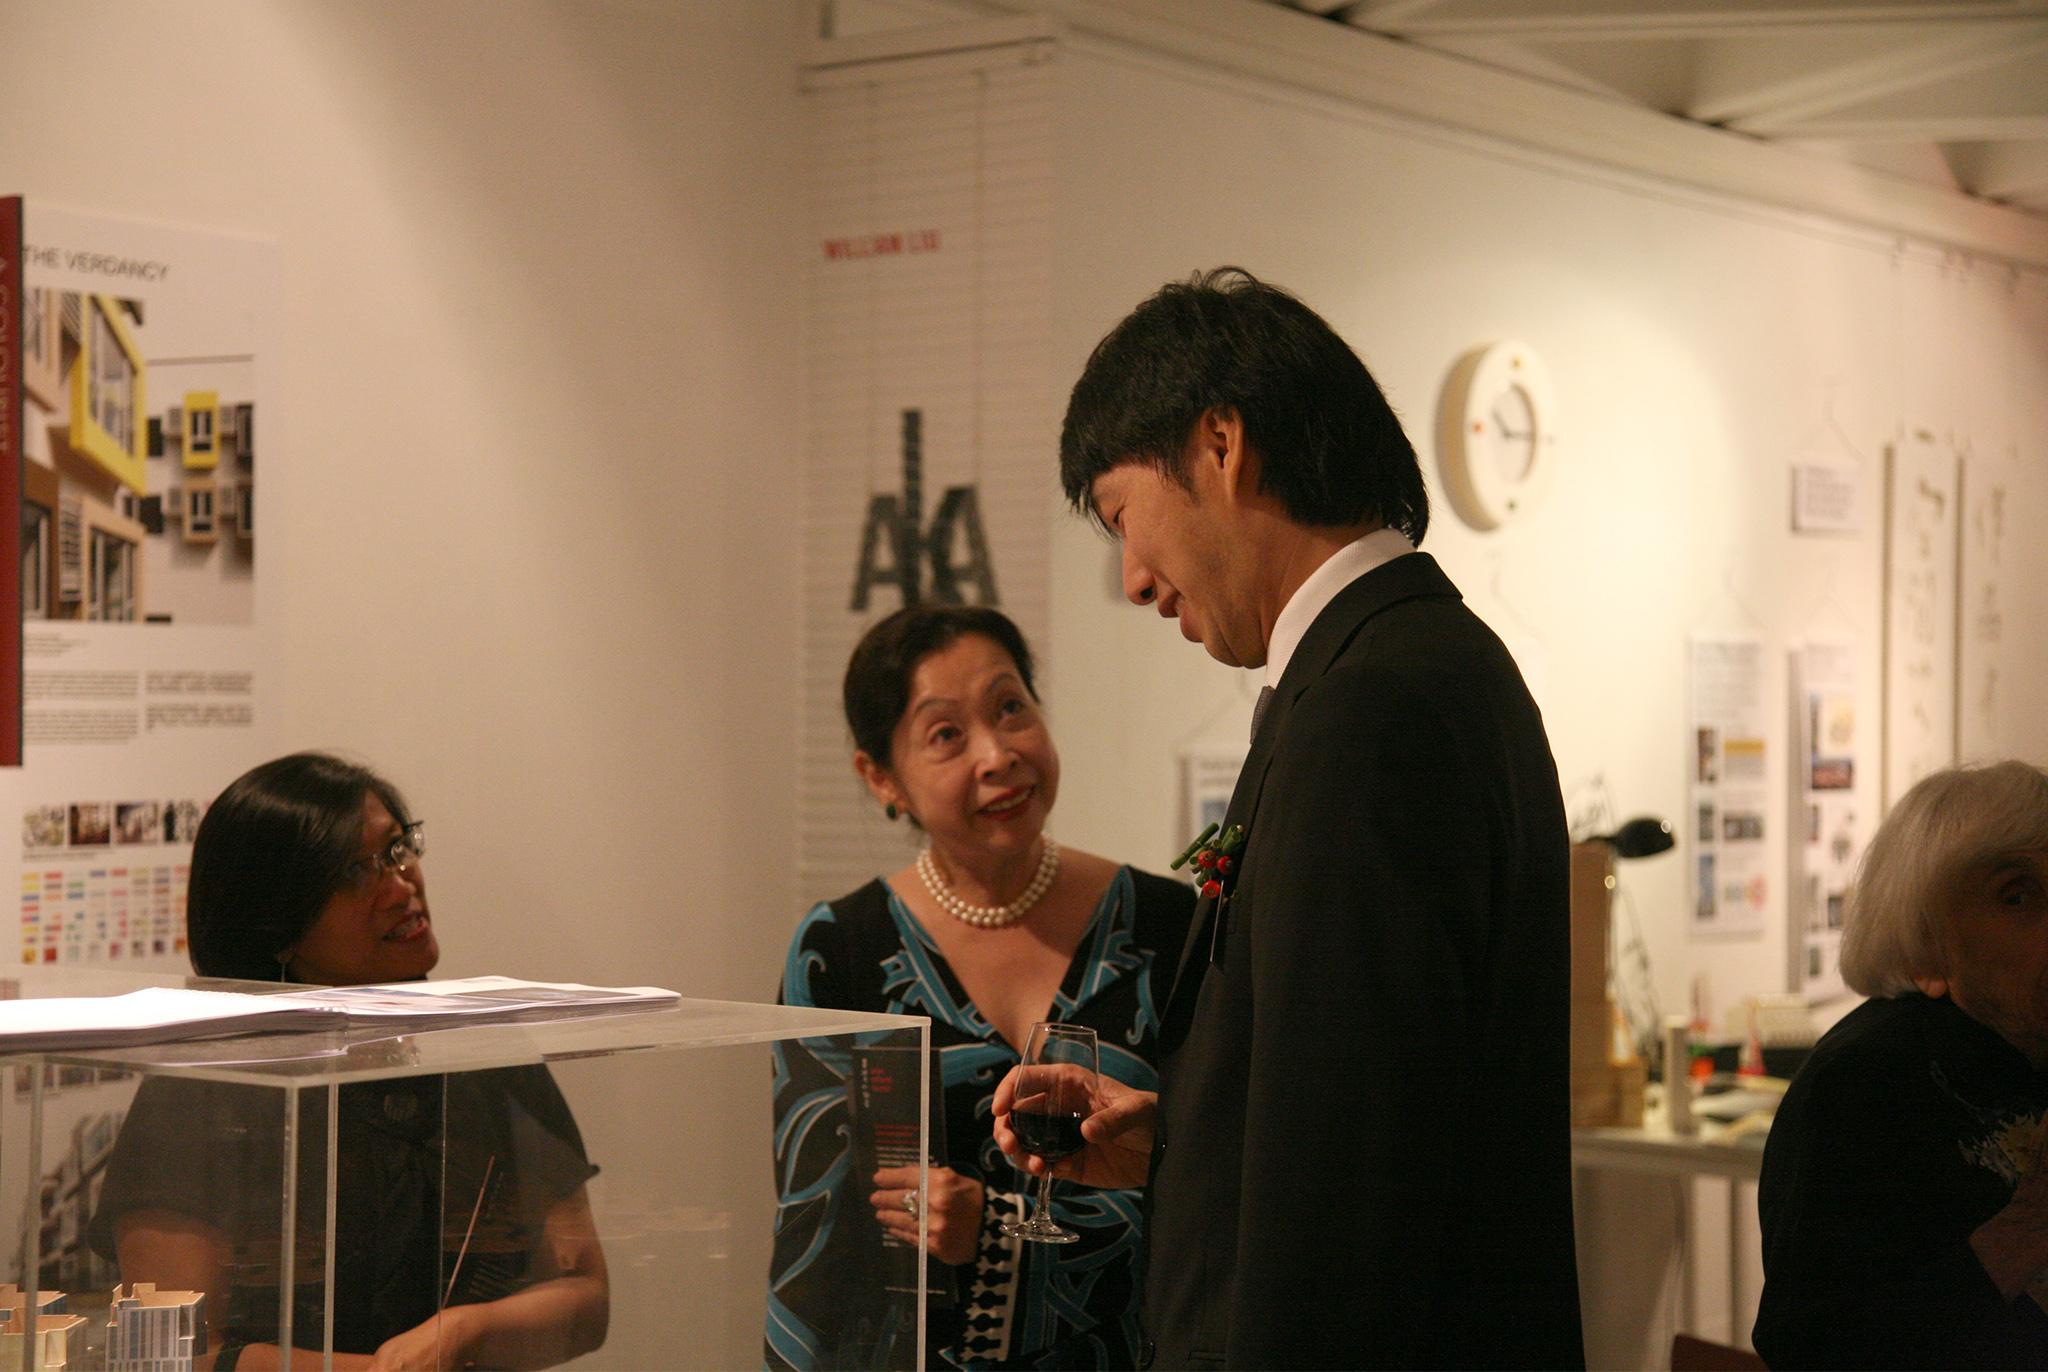 'HIDDEN DIMENSION OF ARCHITECTS', YAA EXHIBITION AT ART CENTER, WANCHAI